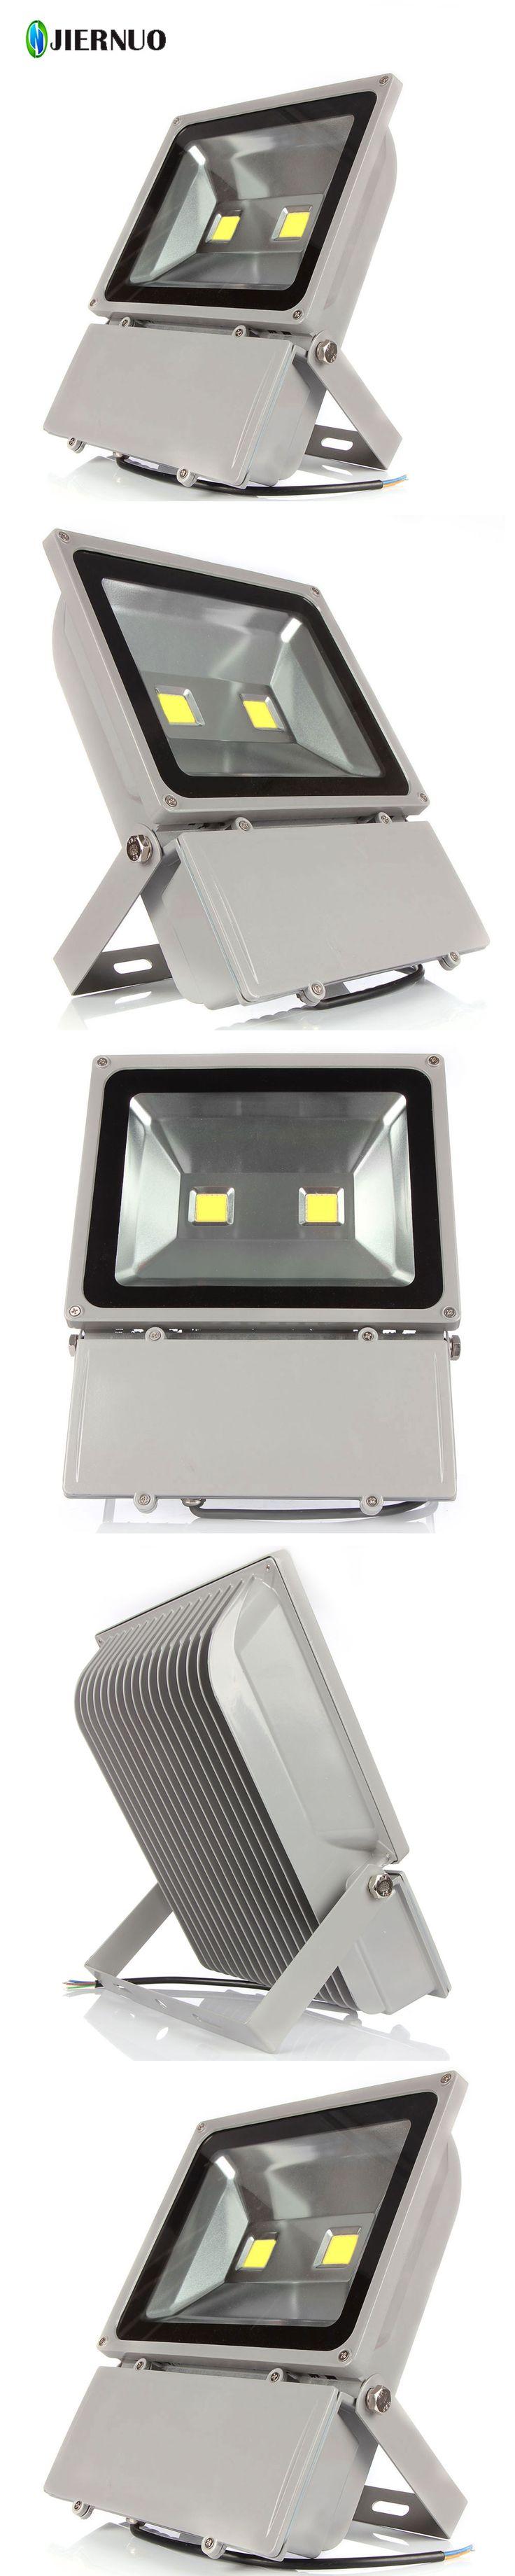 Super Bright LED Flood Light 100W White  AC85-265V Waterproof IP65 Floodlight Spotlight Outdoor Lighting Freeshipping